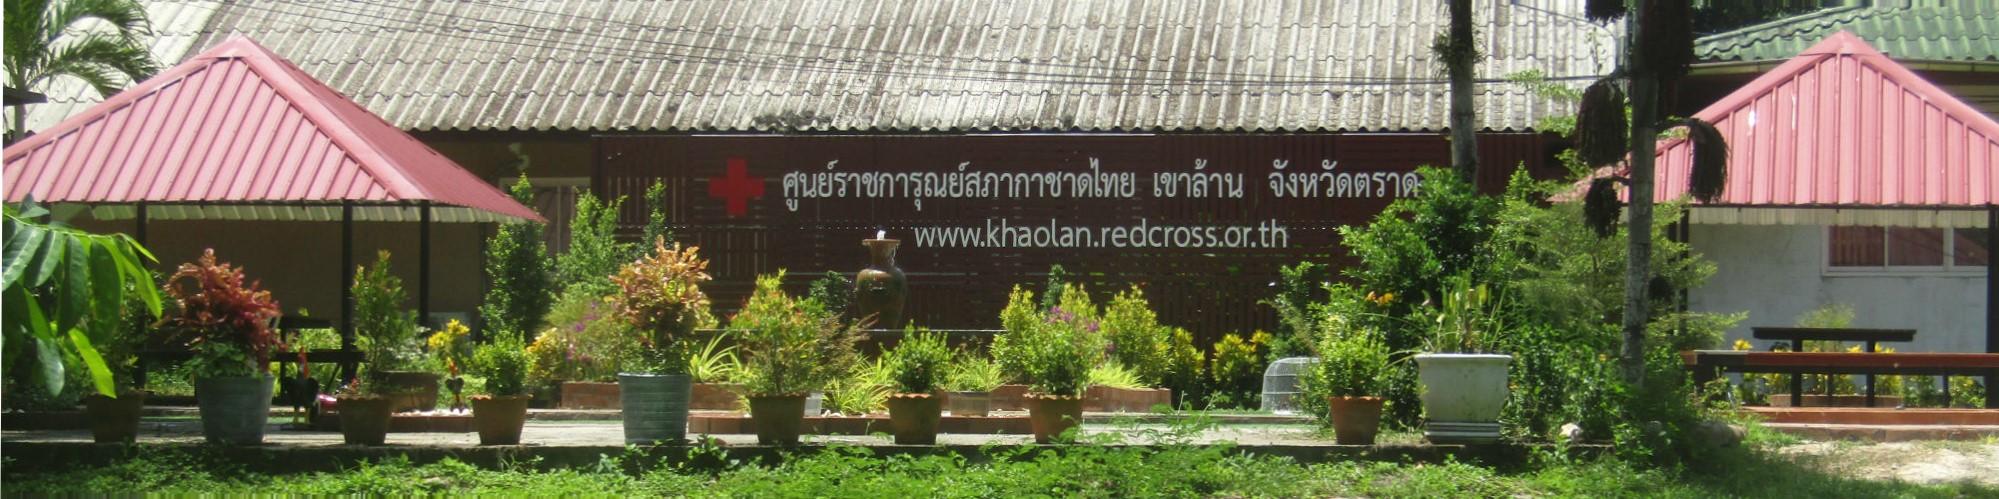 Sala Ratchakarun Thai Red Cross Centre Khao Lan, Khlong Yai District, Trat Province